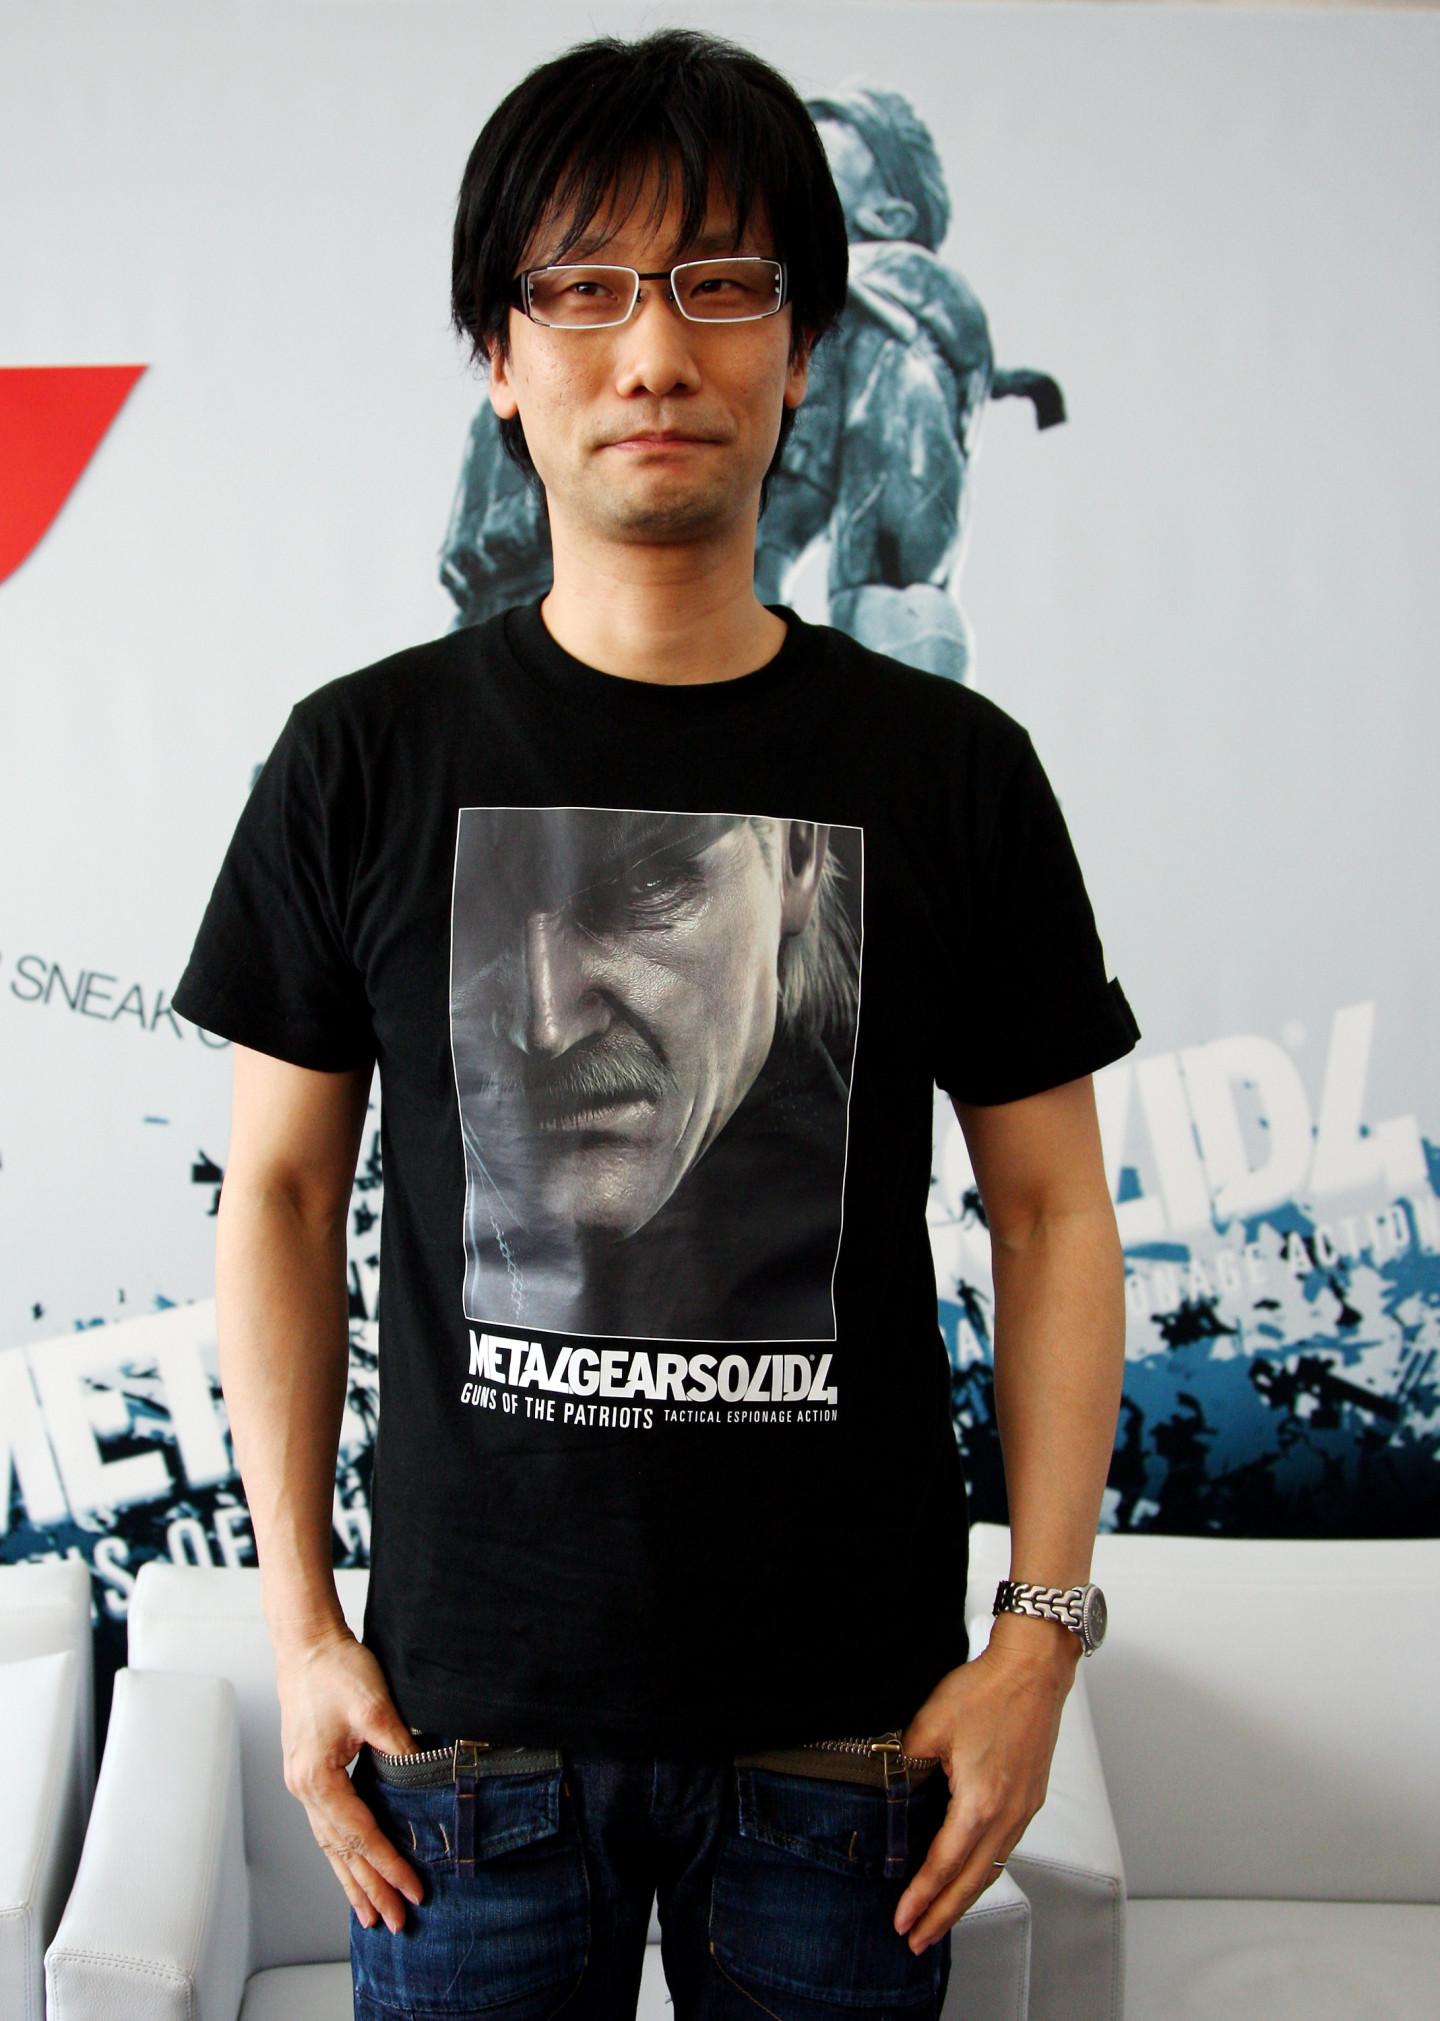 Хидэо Кодзима на презентации игрыMetal Gear Solid 4: Guns of The Patriots в Милане. 2008 год